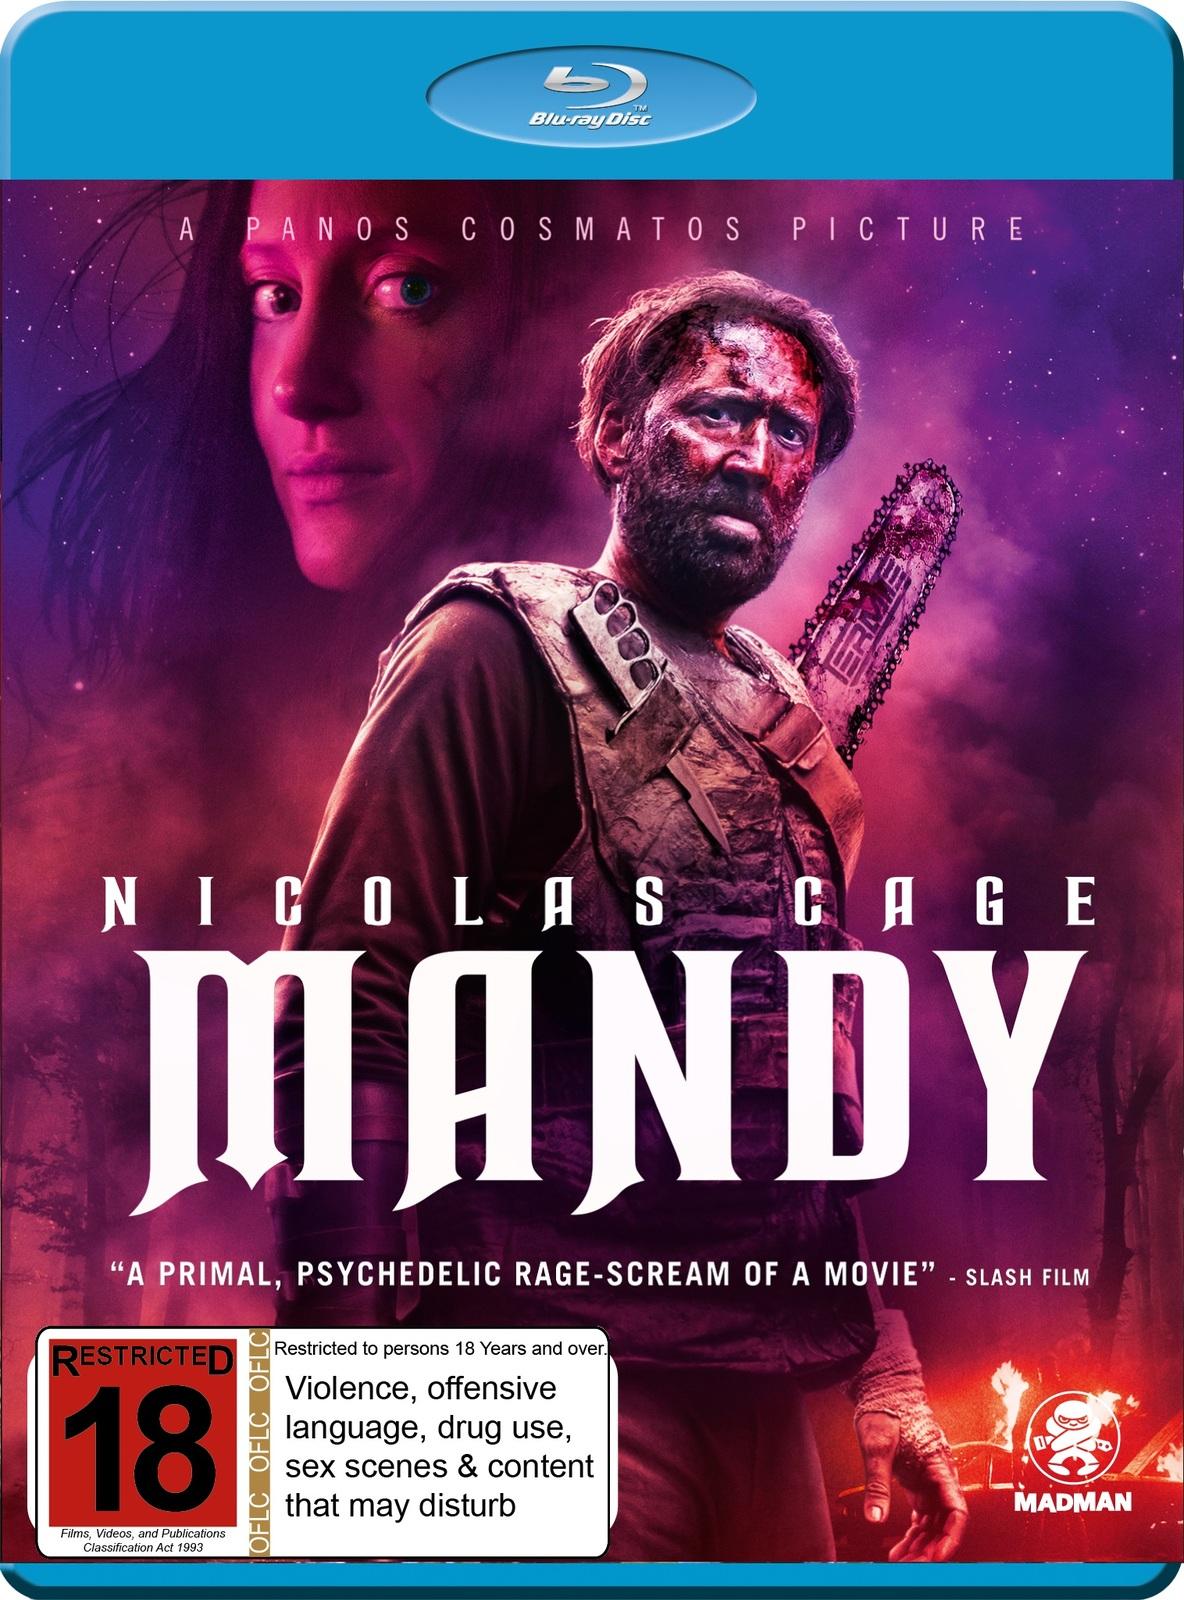 Mandy on Blu-ray image